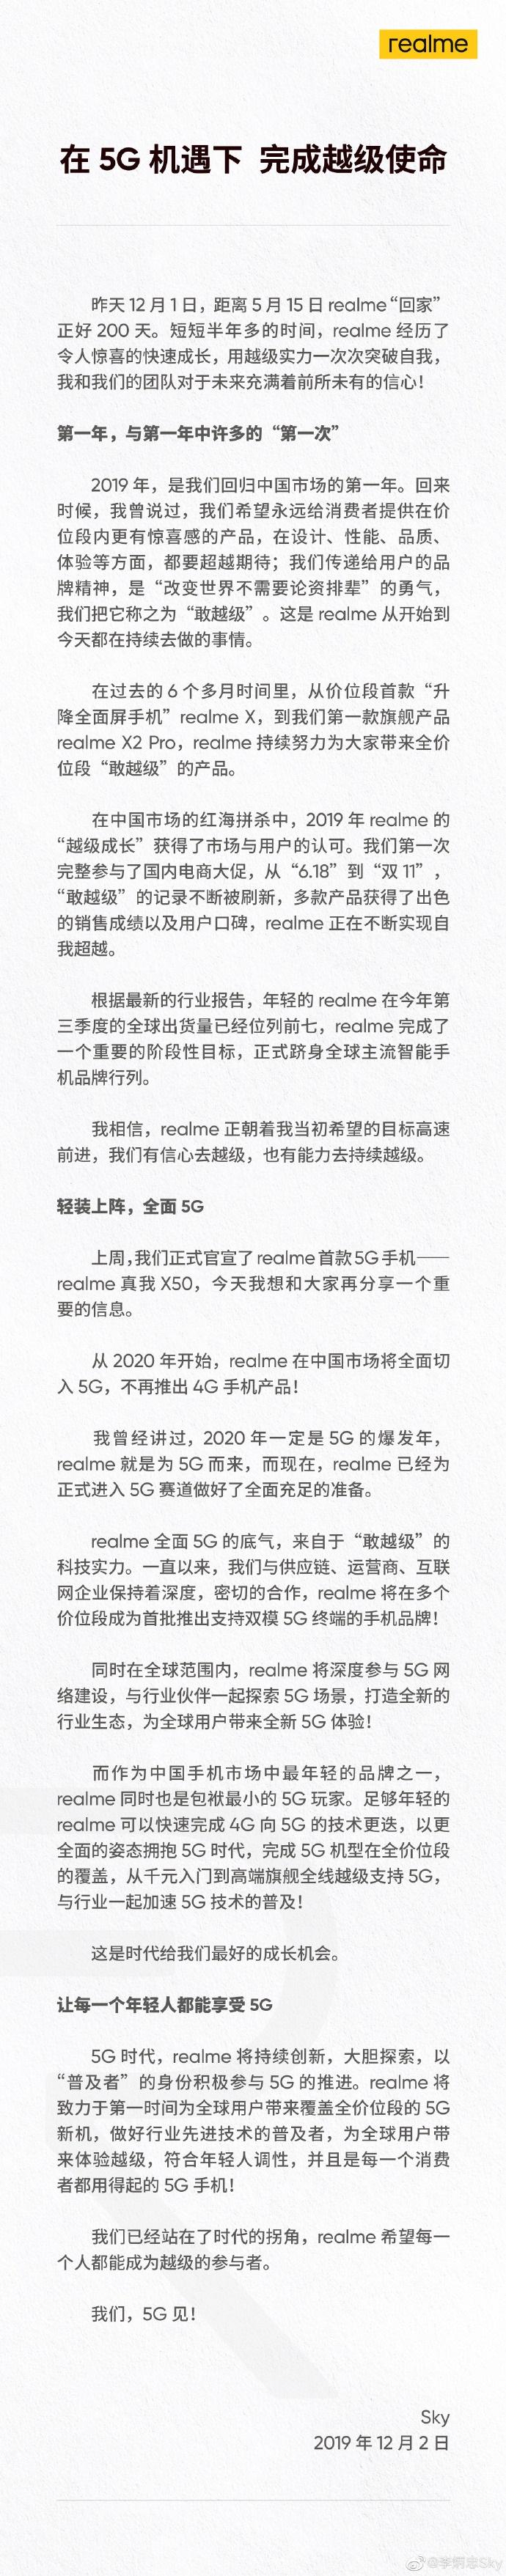 realme CEO:在5G机遇下完成超级使命-玩懂手机网 - 玩懂手机第一手的手机资讯网(www.wdshouji.com)